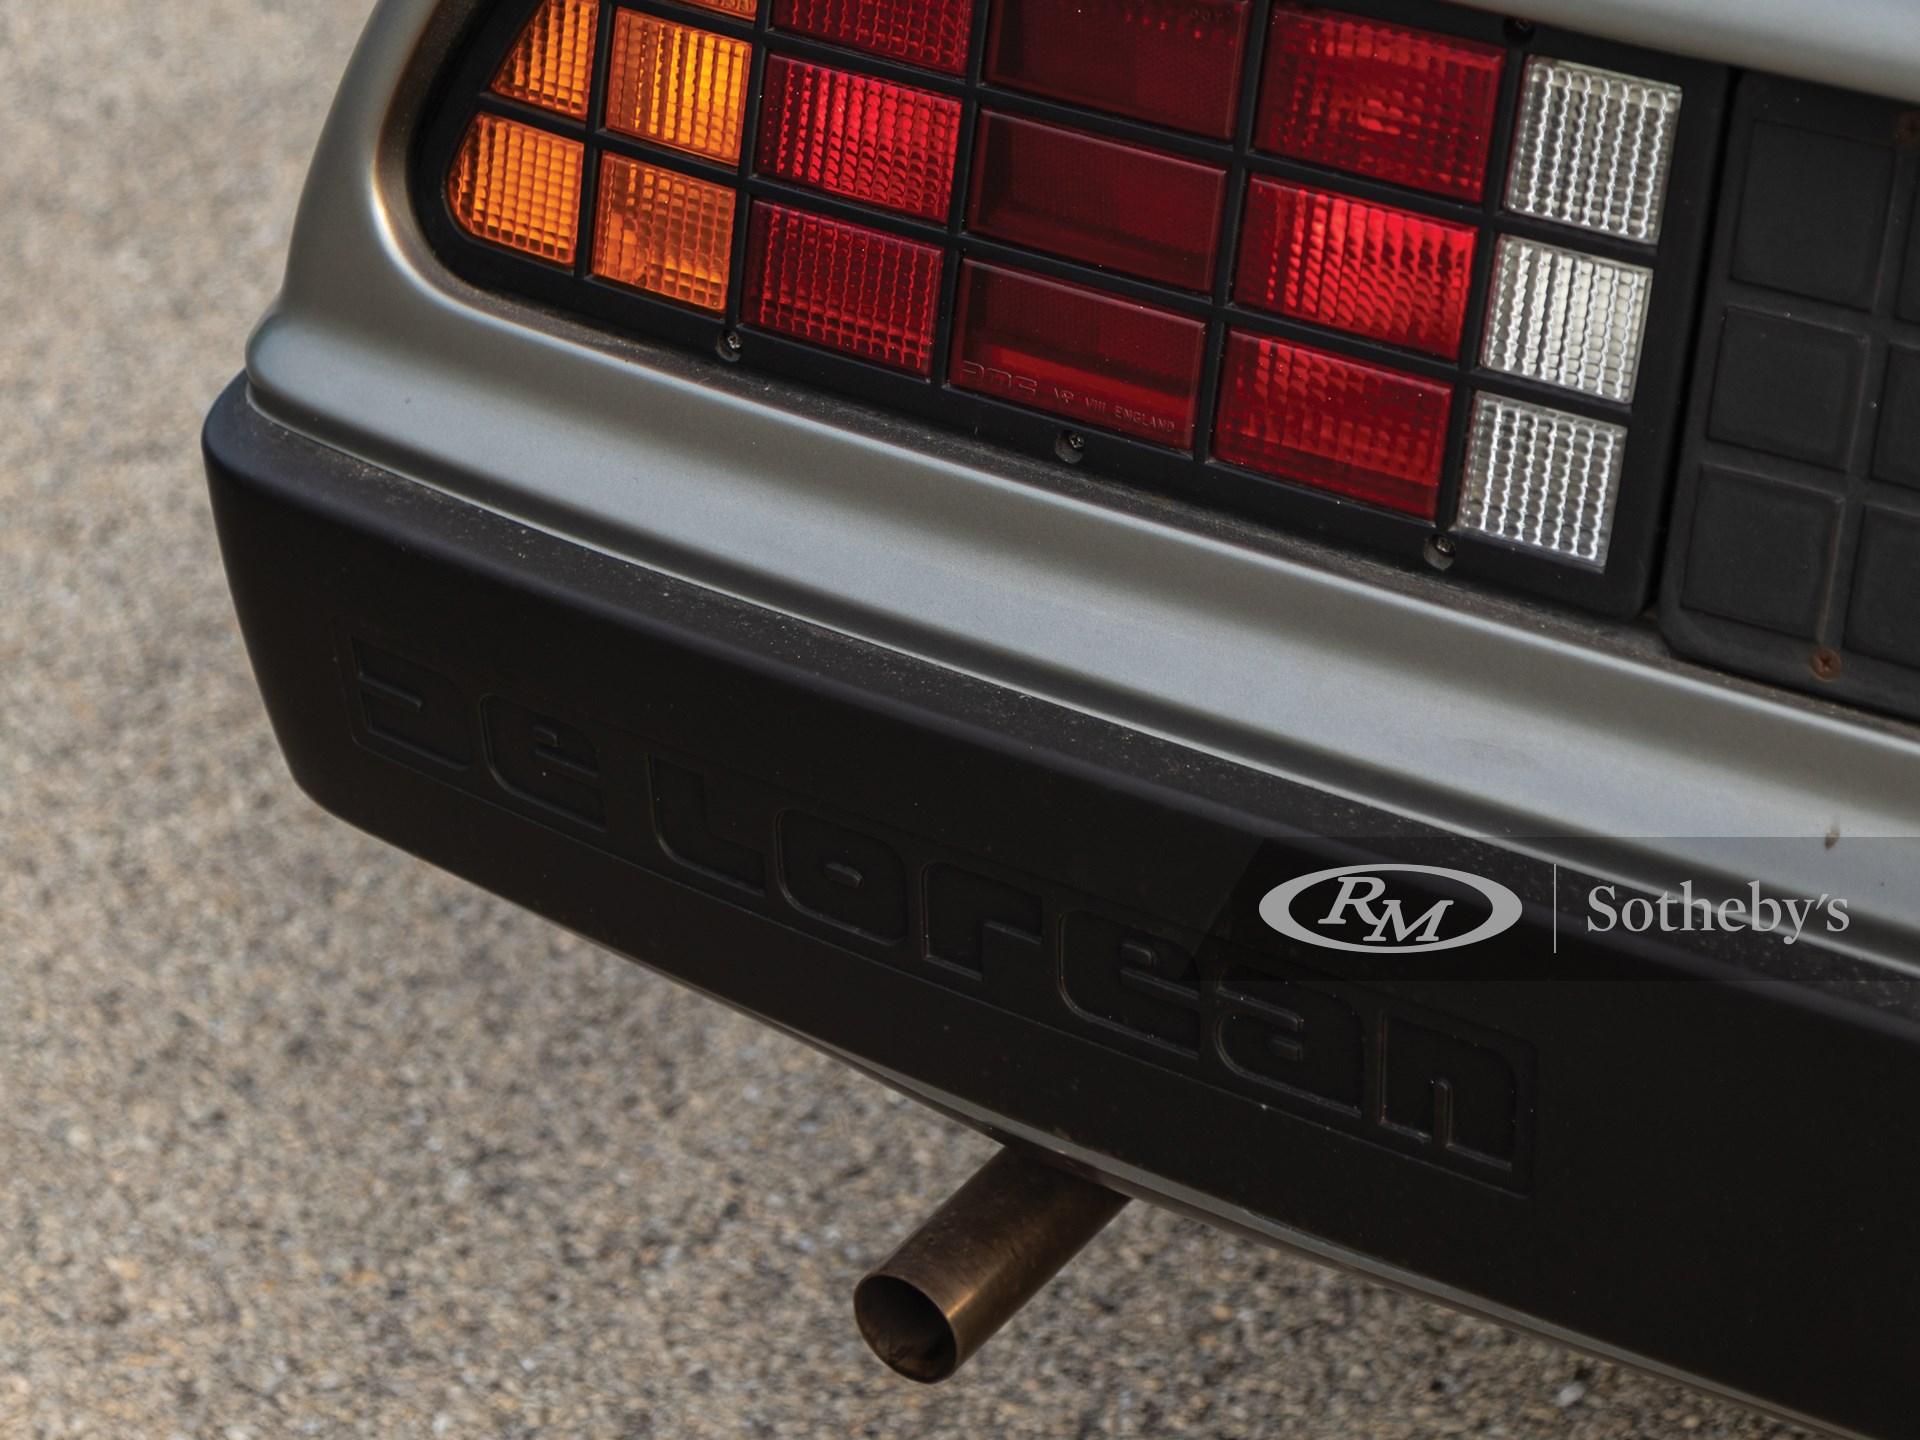 1981 DeLorean DMC-12  -